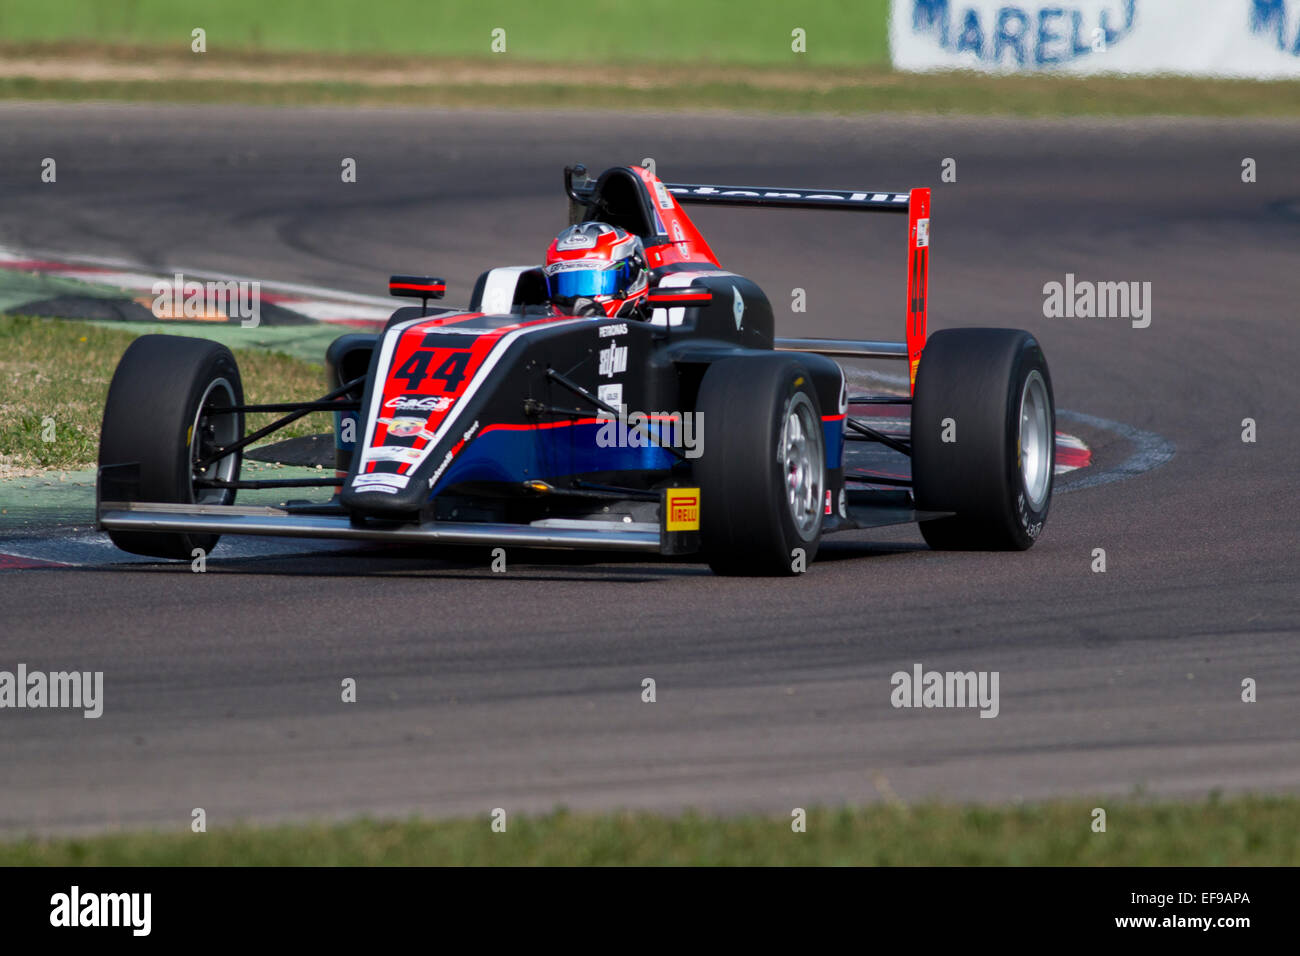 Imola, Italy - October 11, 2014: A Tatuus F.4 T014 Abarth of Antonelli Motorsportteam, driven By Desideri Matteo Stock Photo